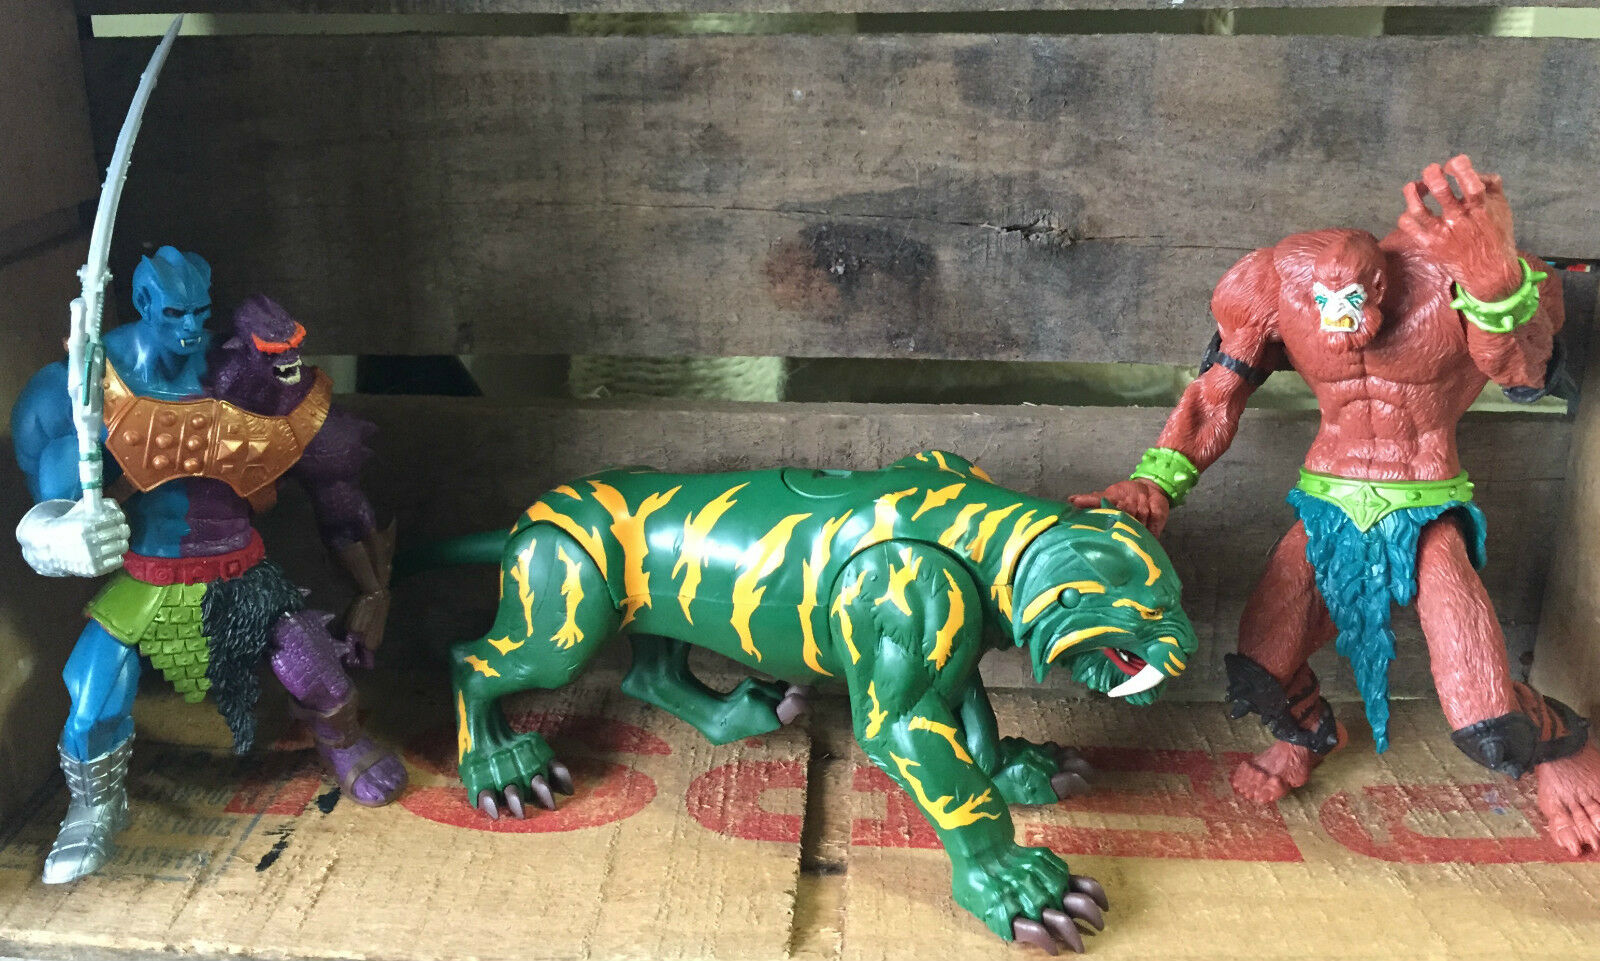 200x 200x 200x He-Man Masters of the Universe Two-Bad, Beast Man, Battle Cat MOTU Figures cdf754